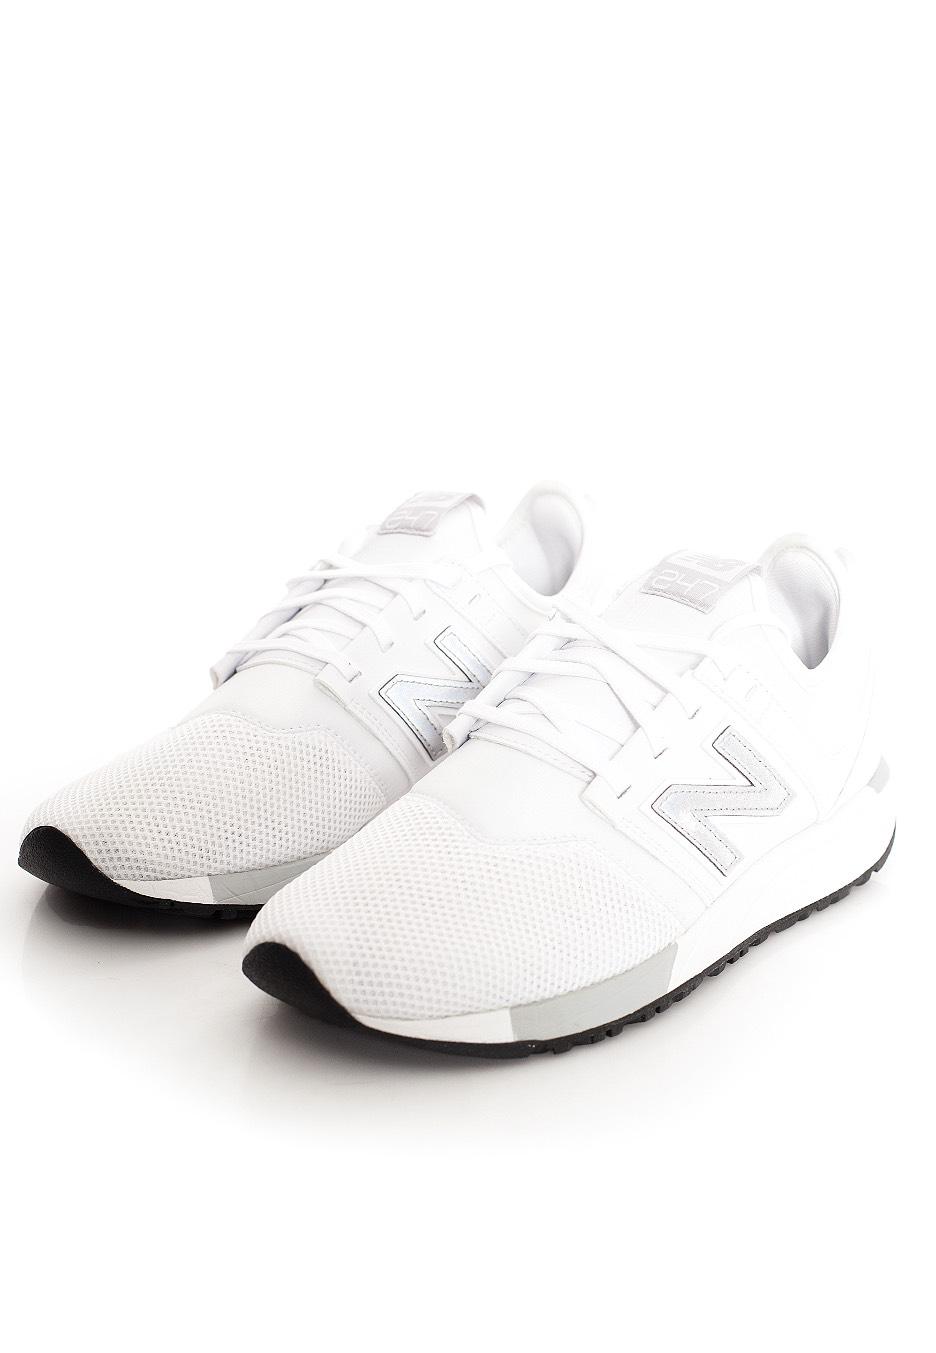 New Balance - MRL247 D OM White - Shoes